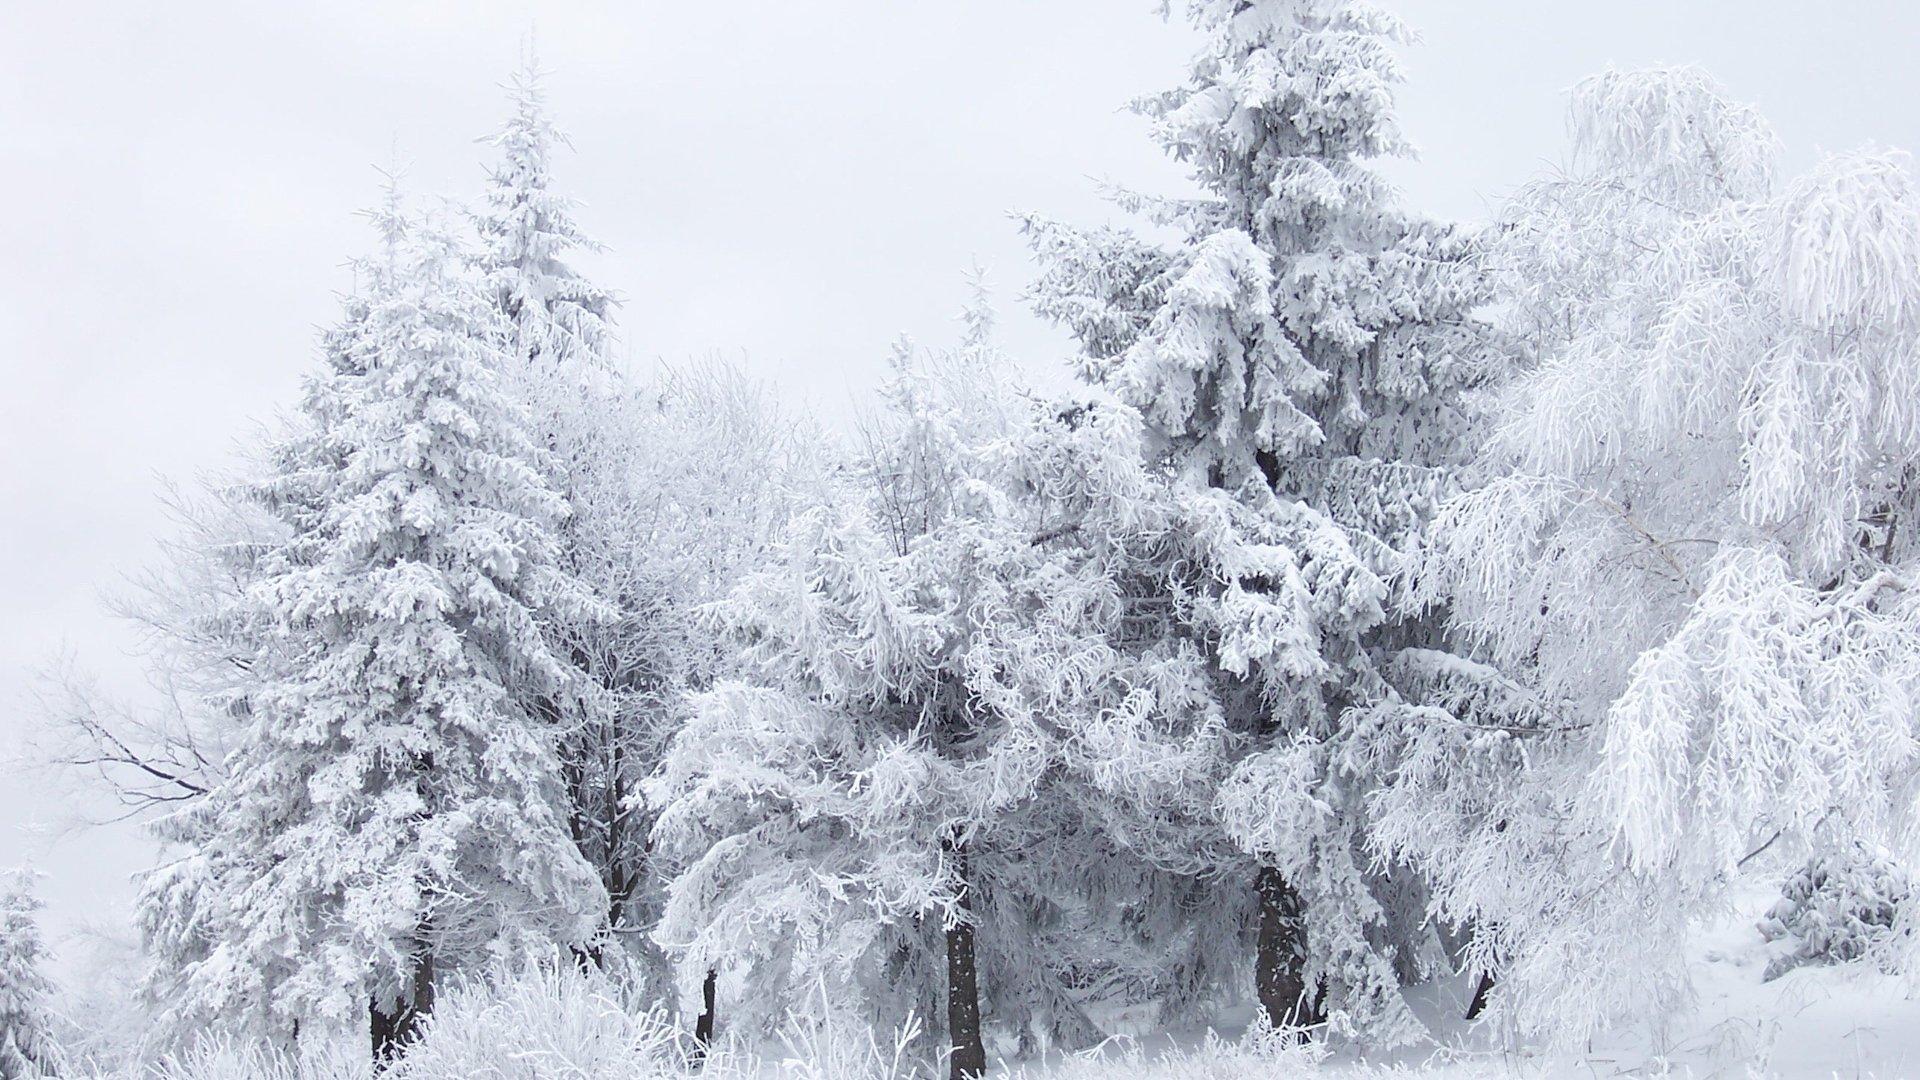 snow wallpaper mobile